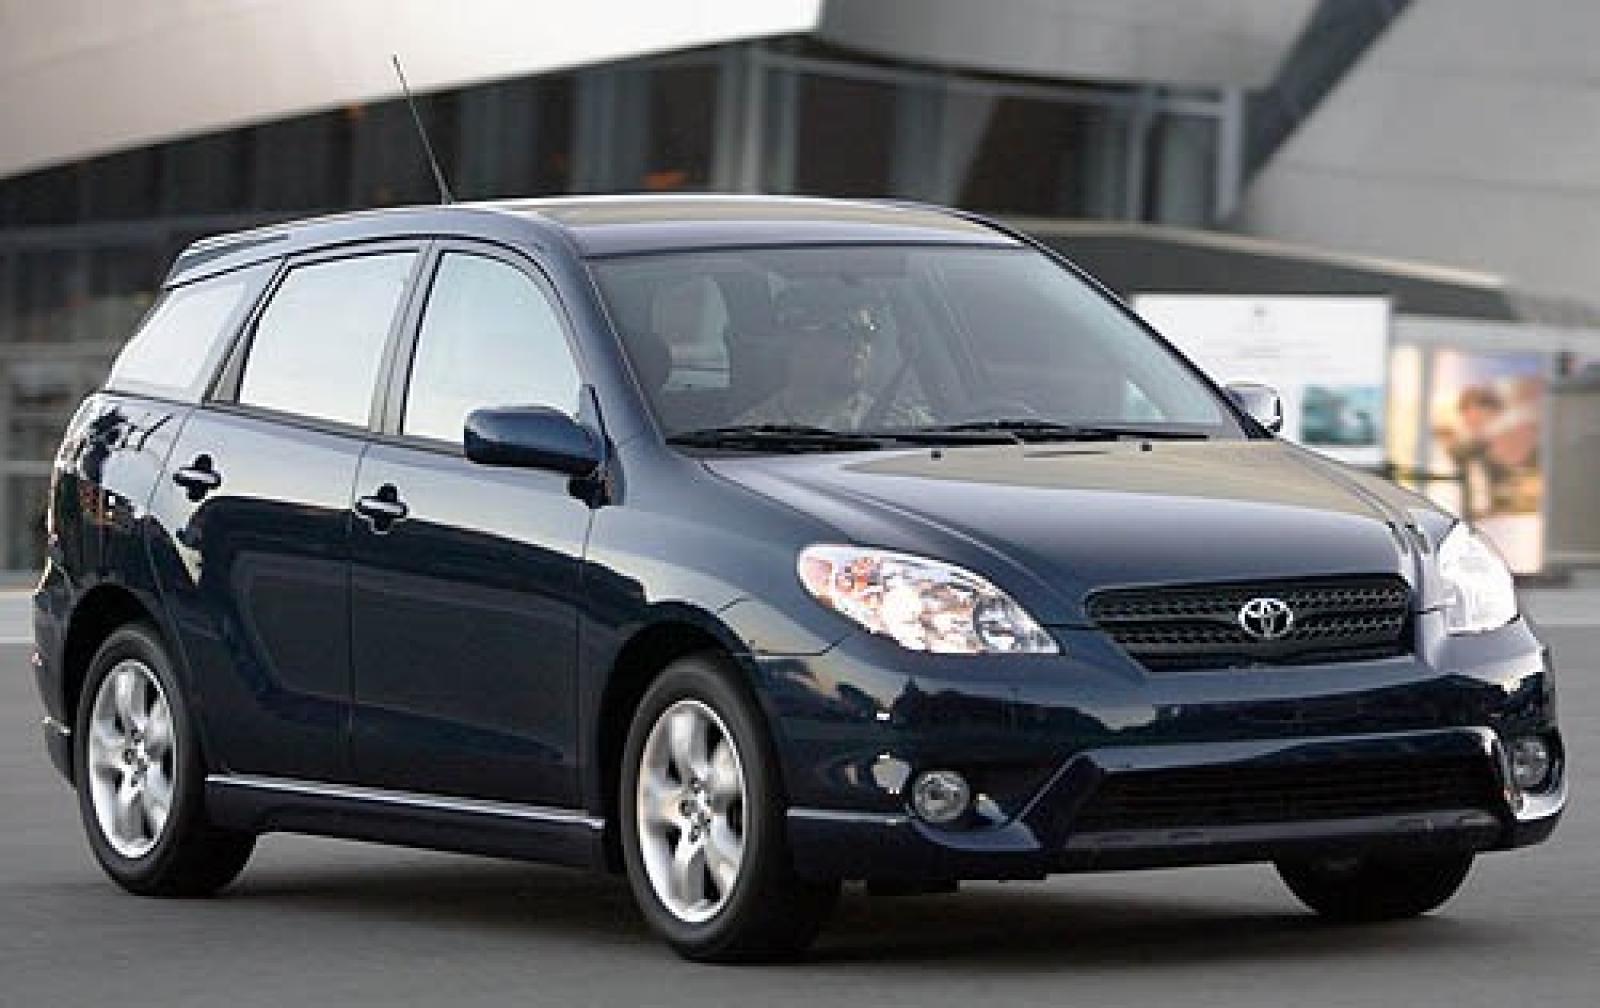 2008 Toyota Matrix Information And Photos Zombiedrive